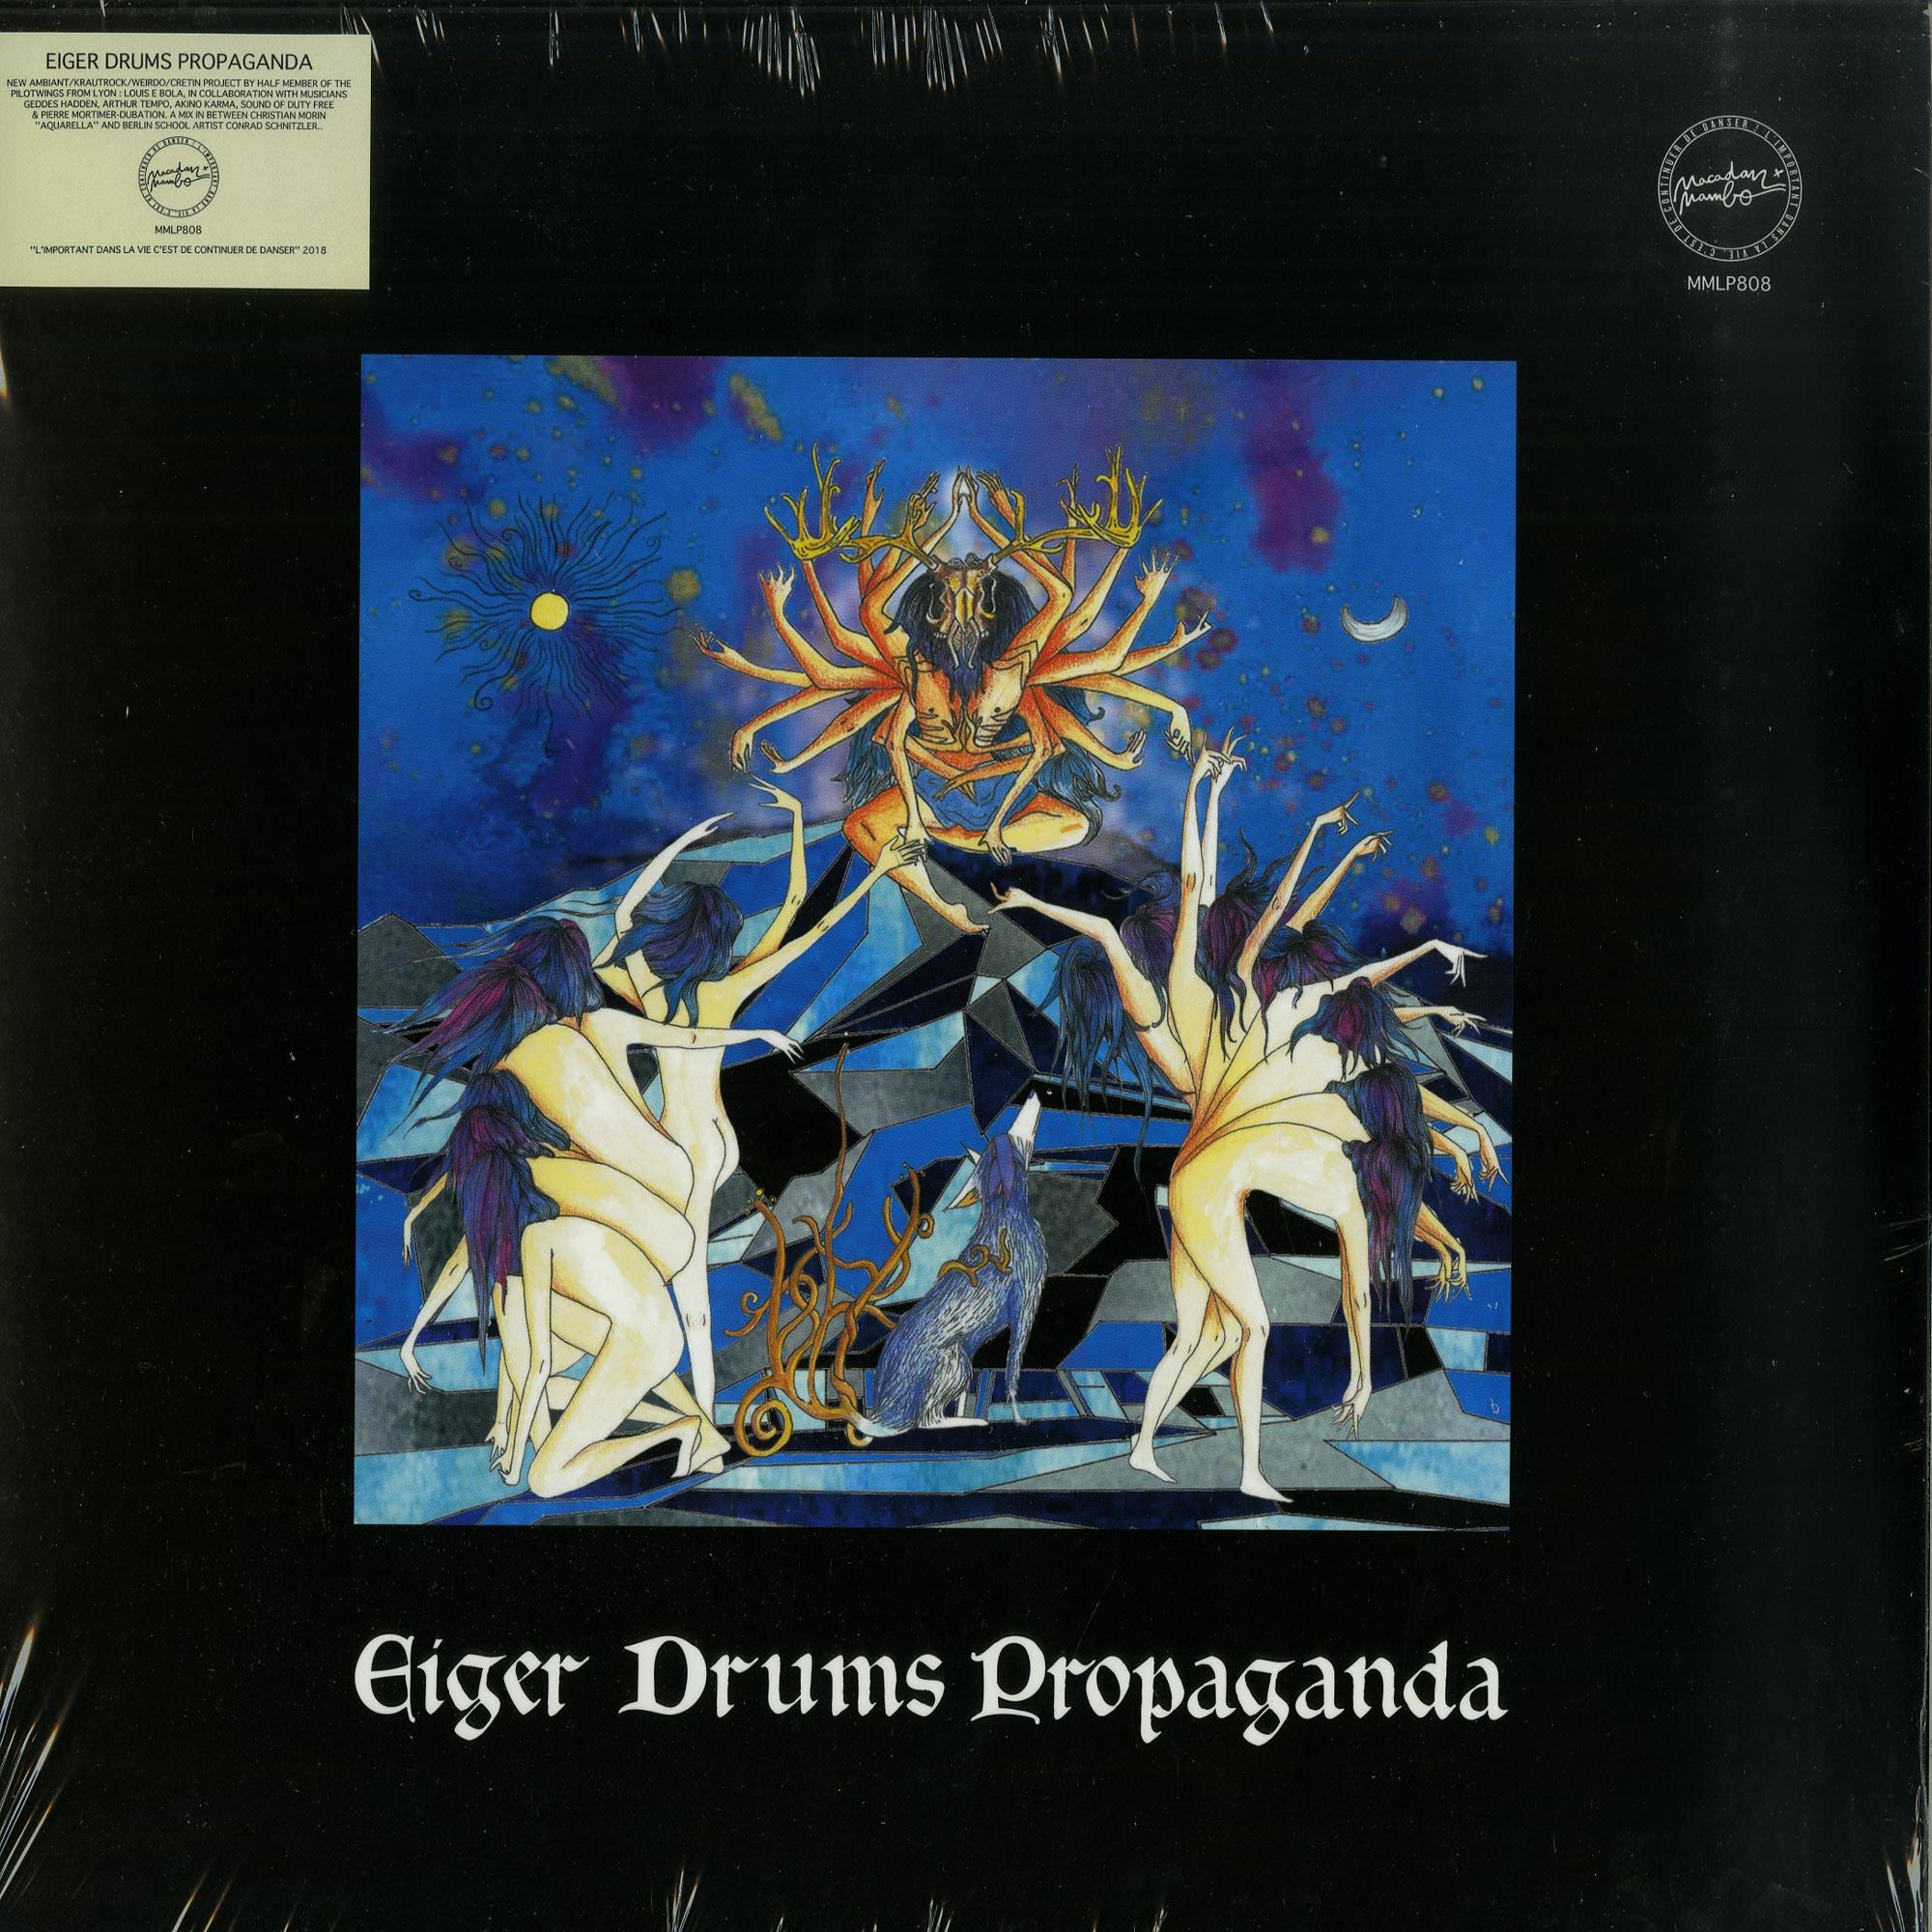 Eiger Drums Propaganda - EIGER DRUMS PROPAGANDA